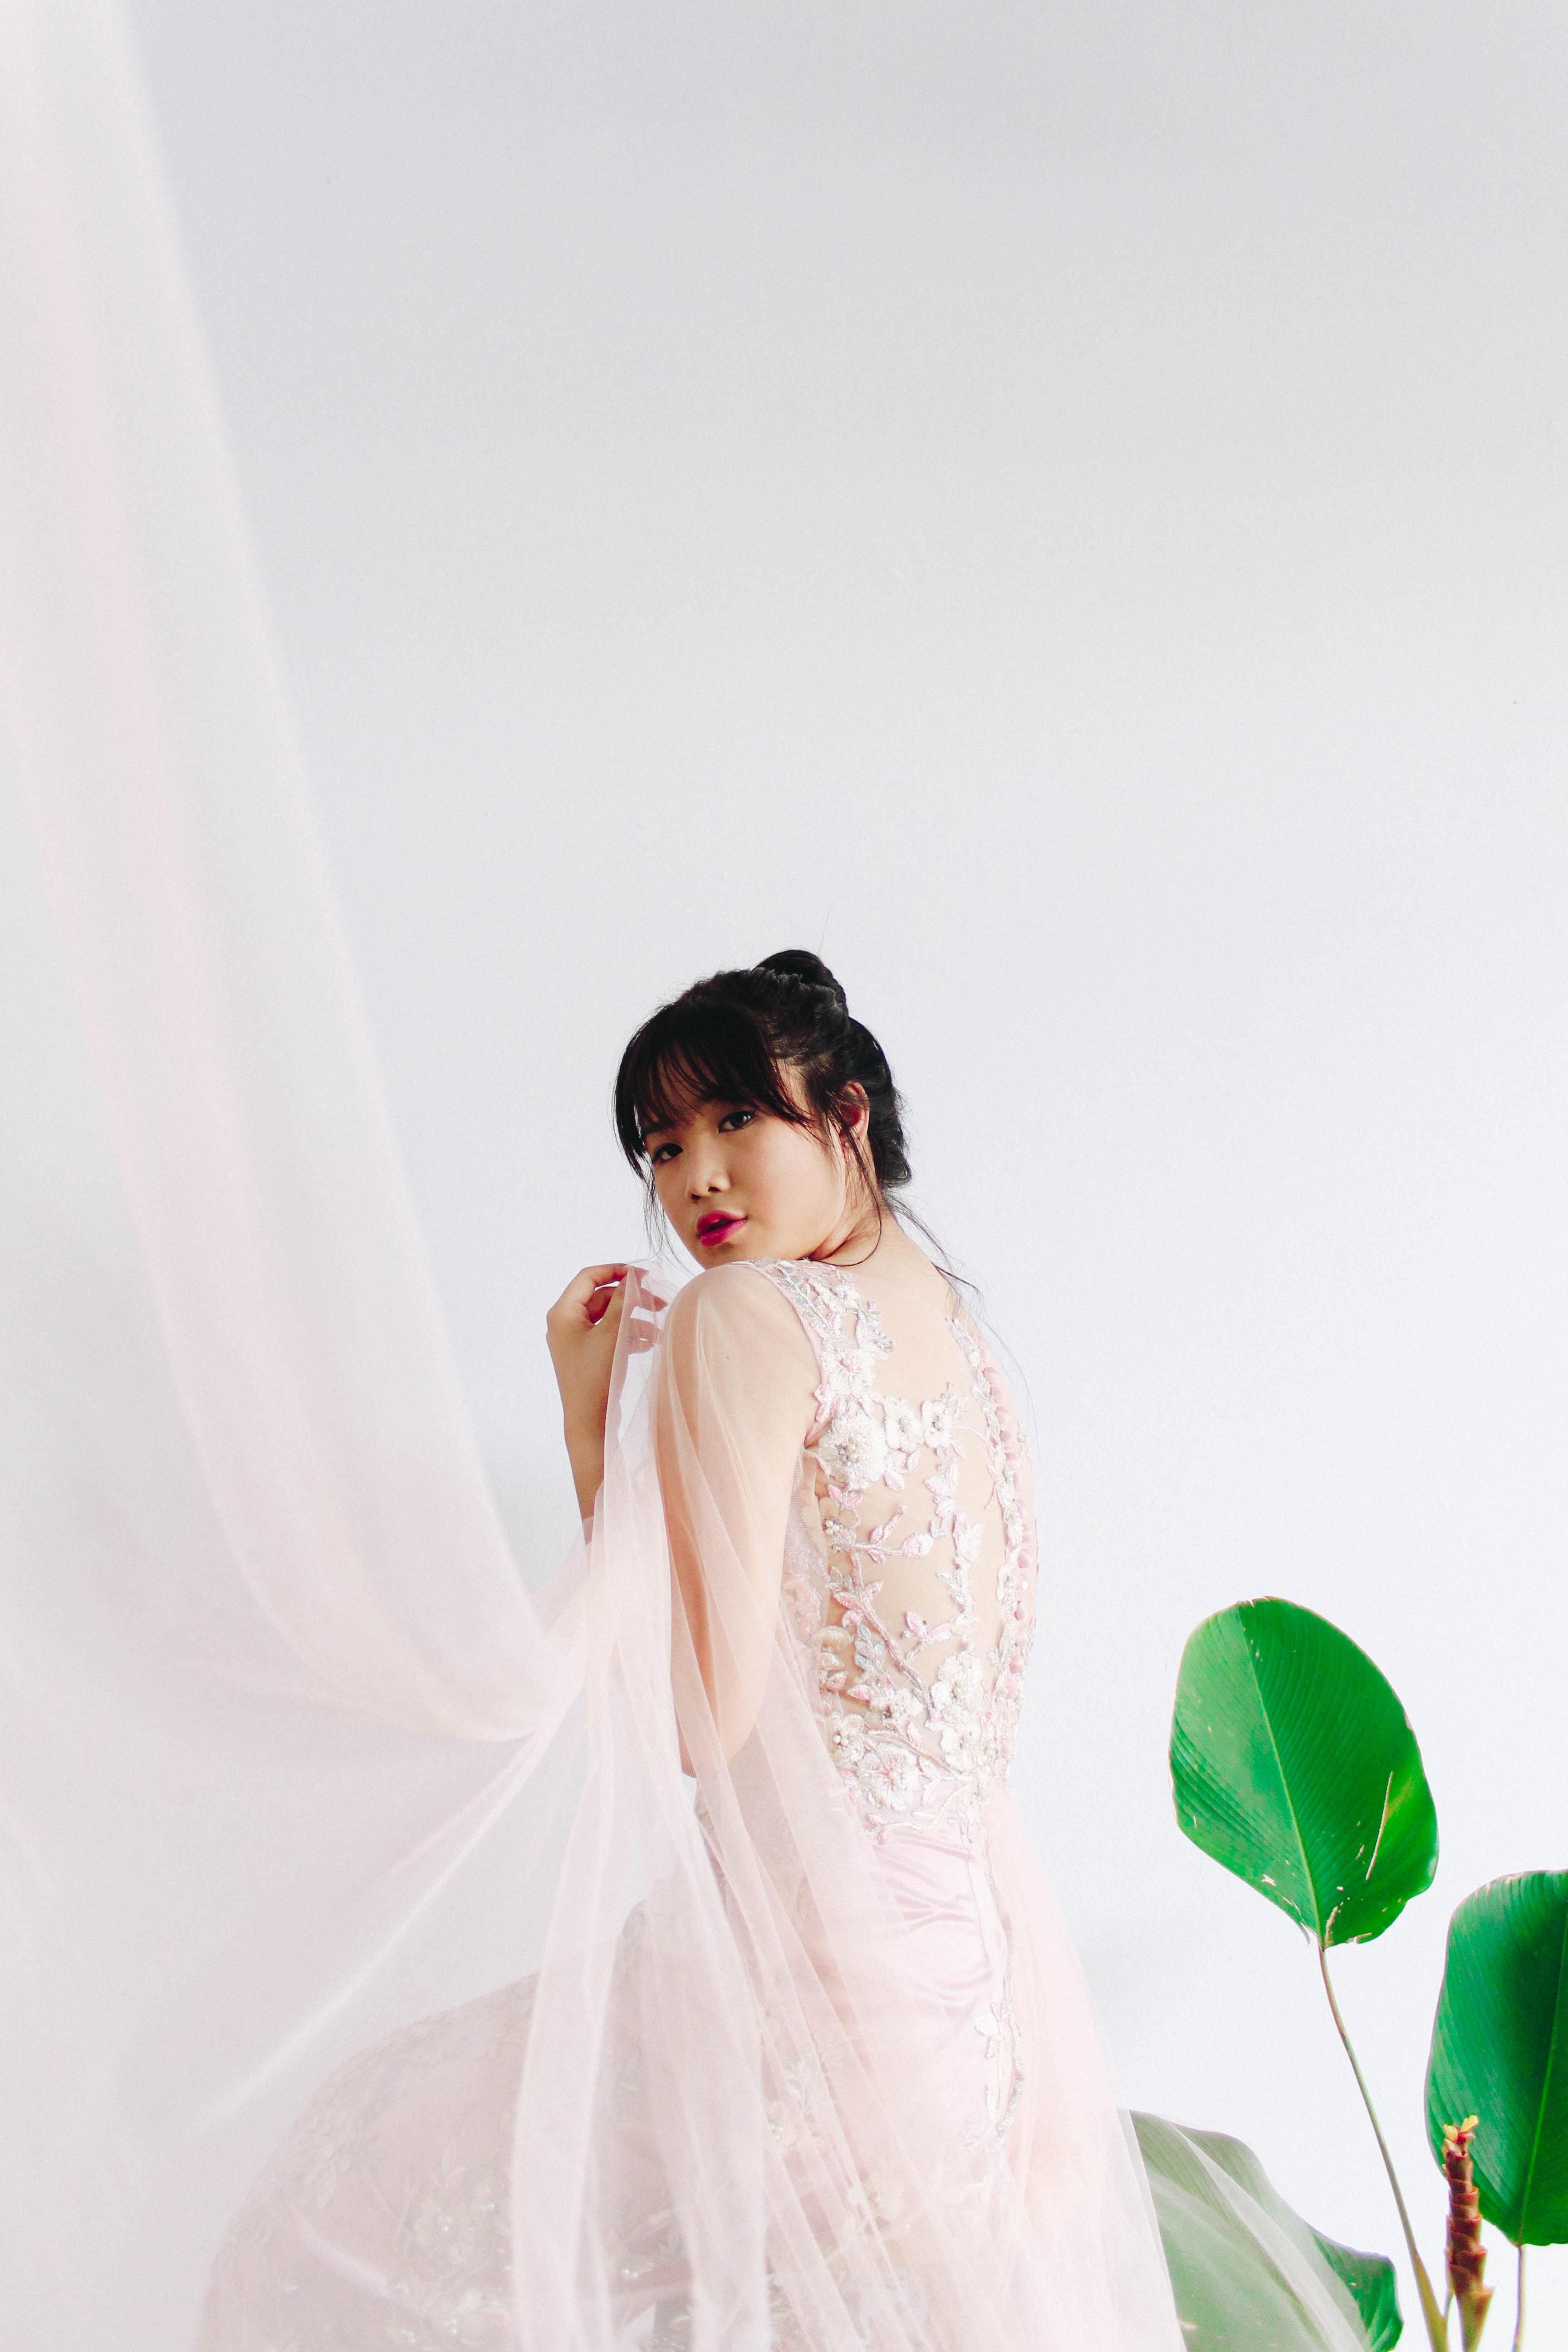 woman wearing white floral sleeveless wedding dress